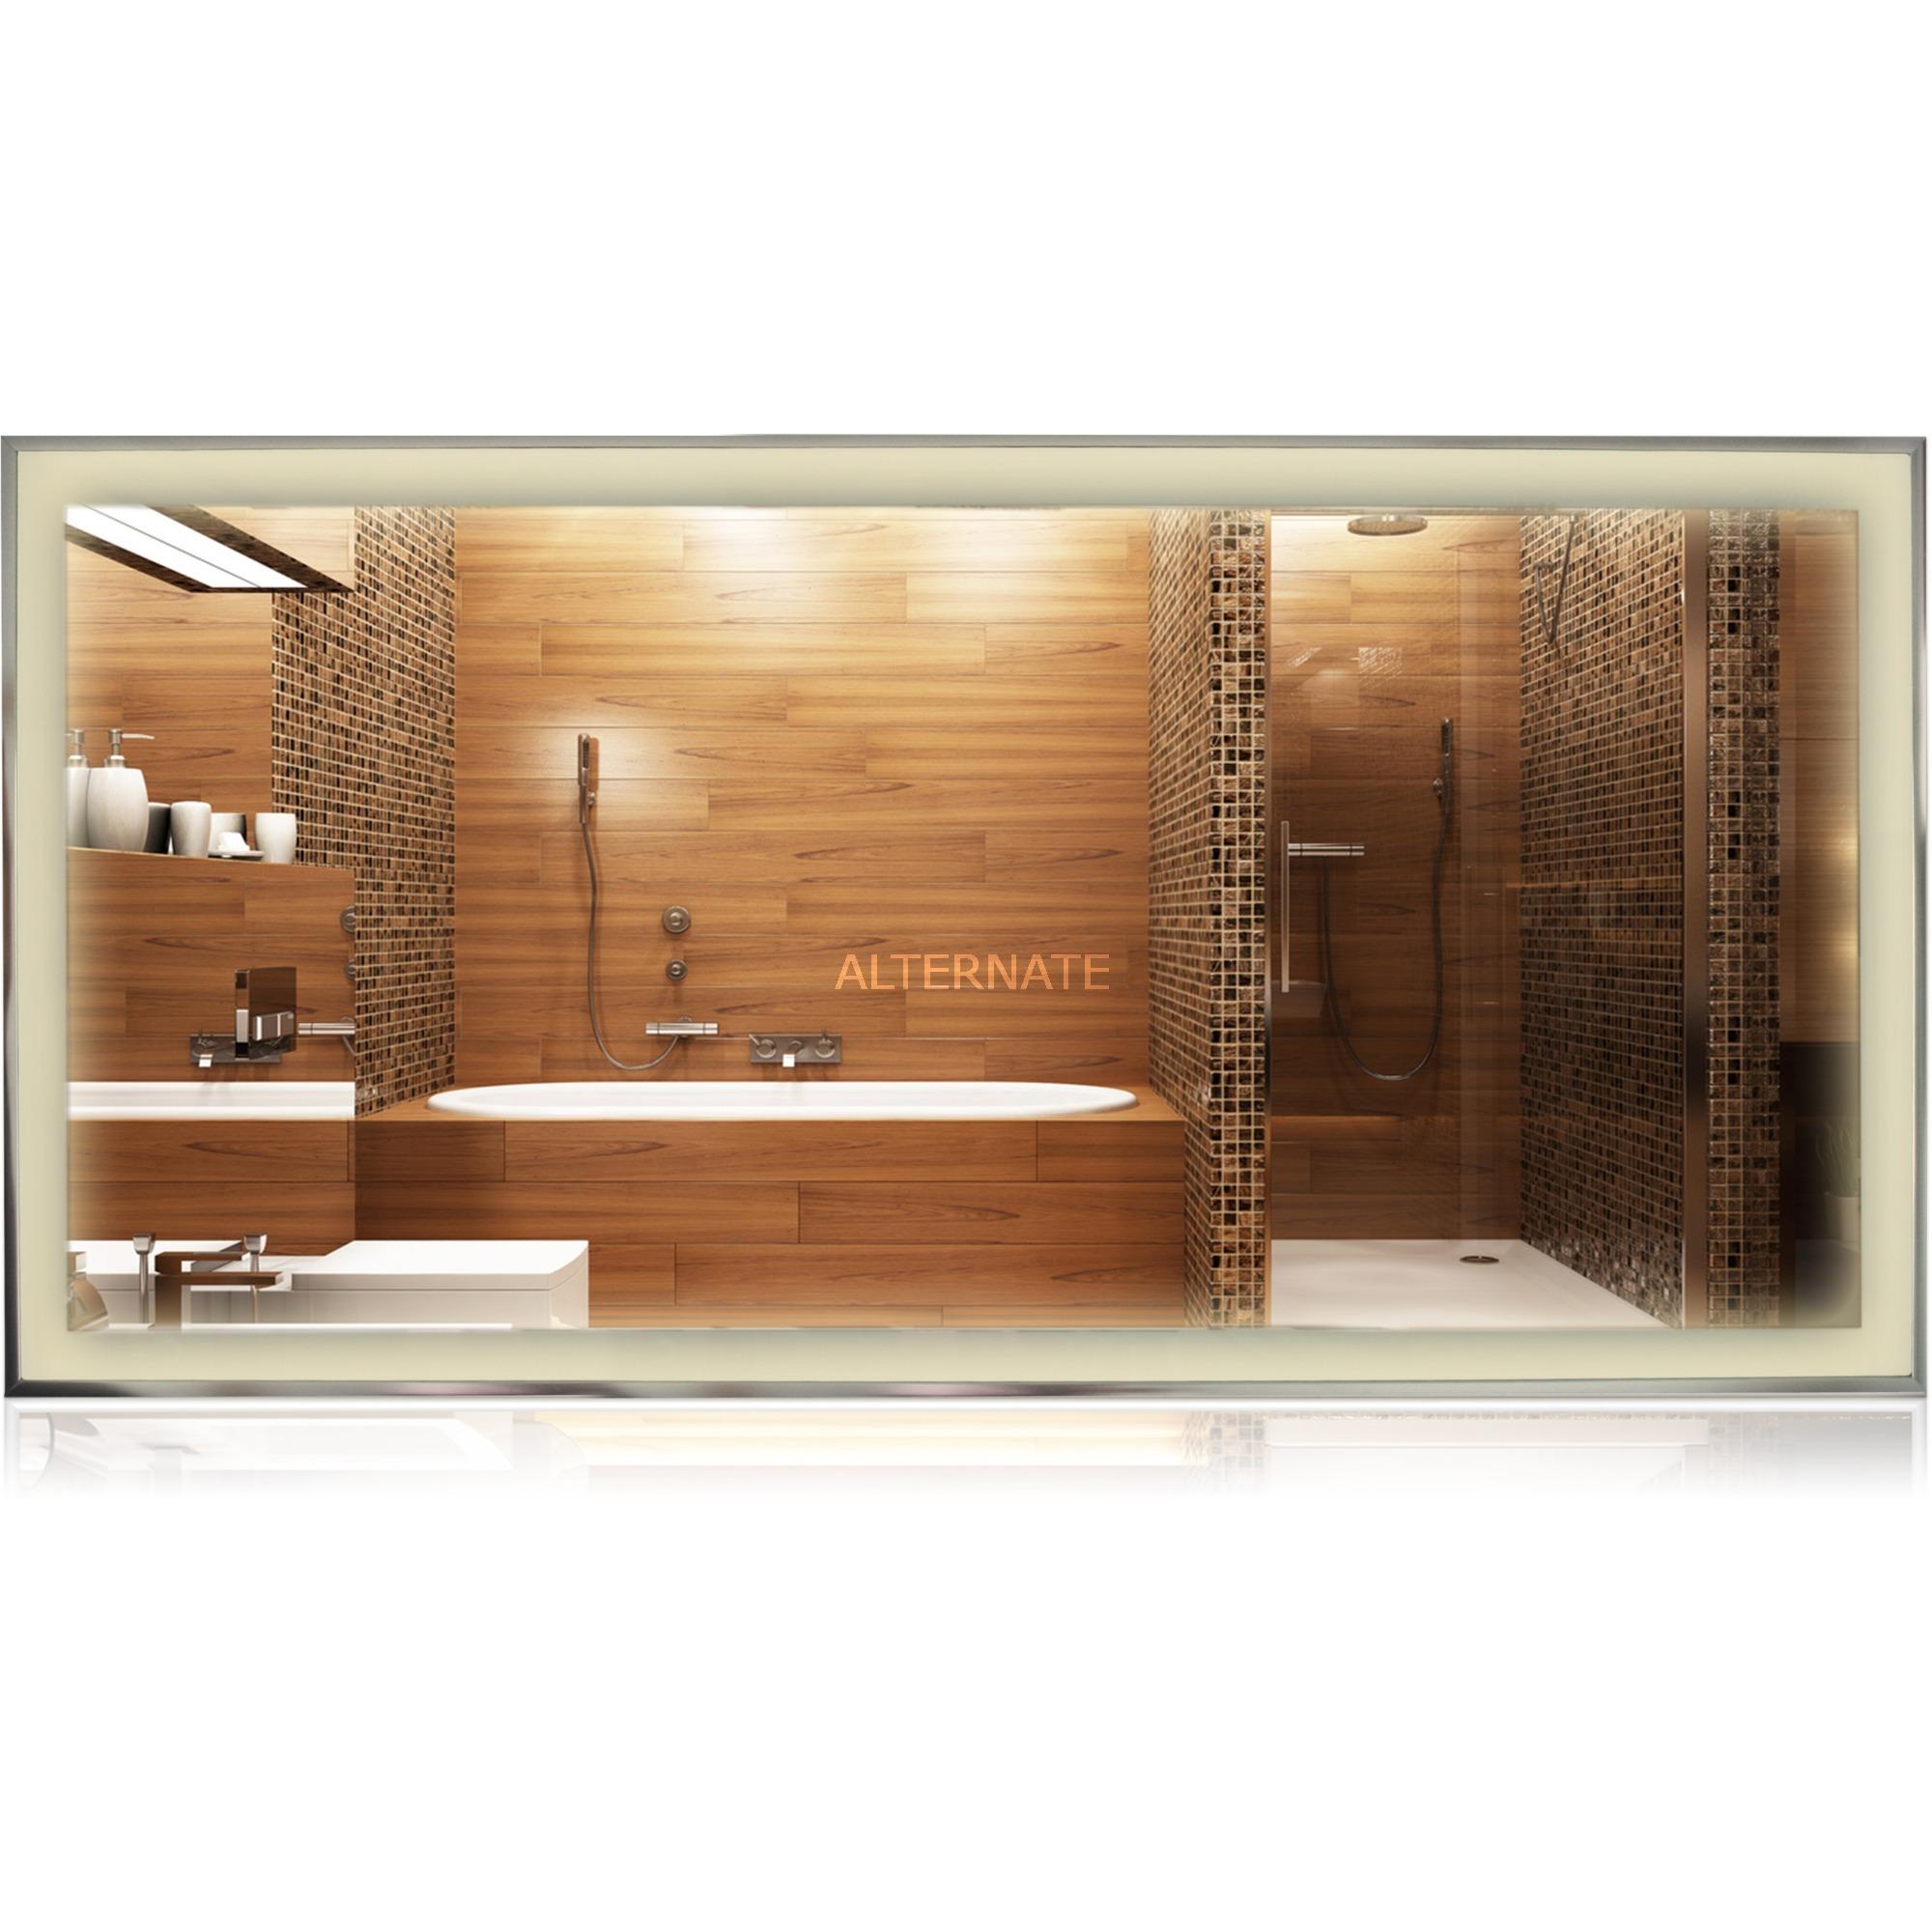 Infranomic LED-Line Spiegelheizelement, Infrarot-Heizung